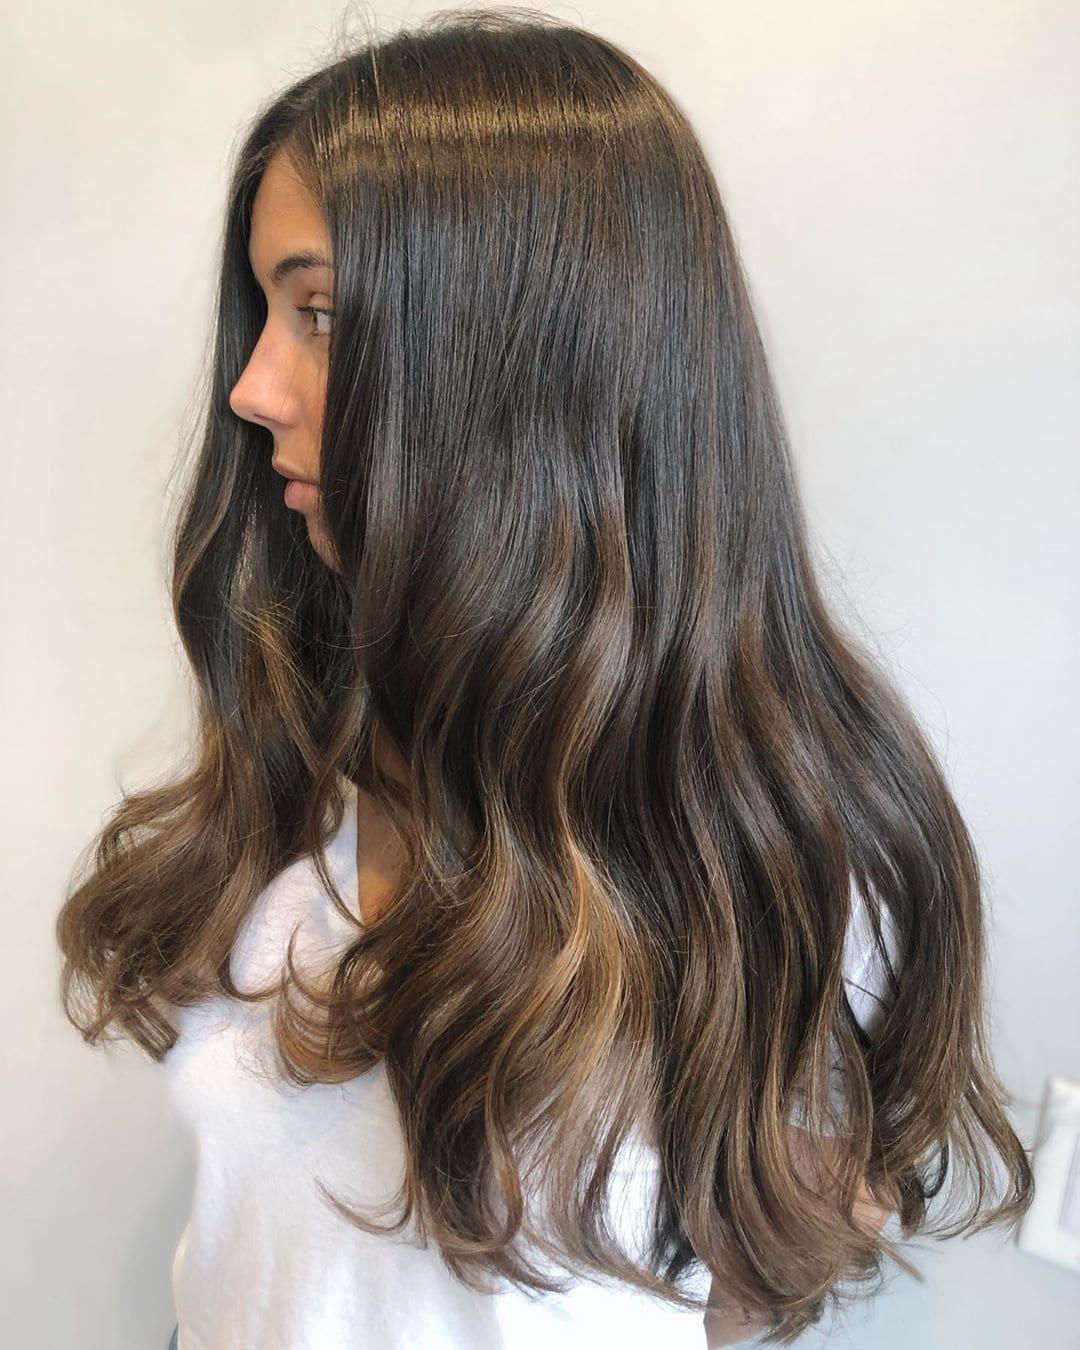 Woman with long wavy dark brunette balayage hair